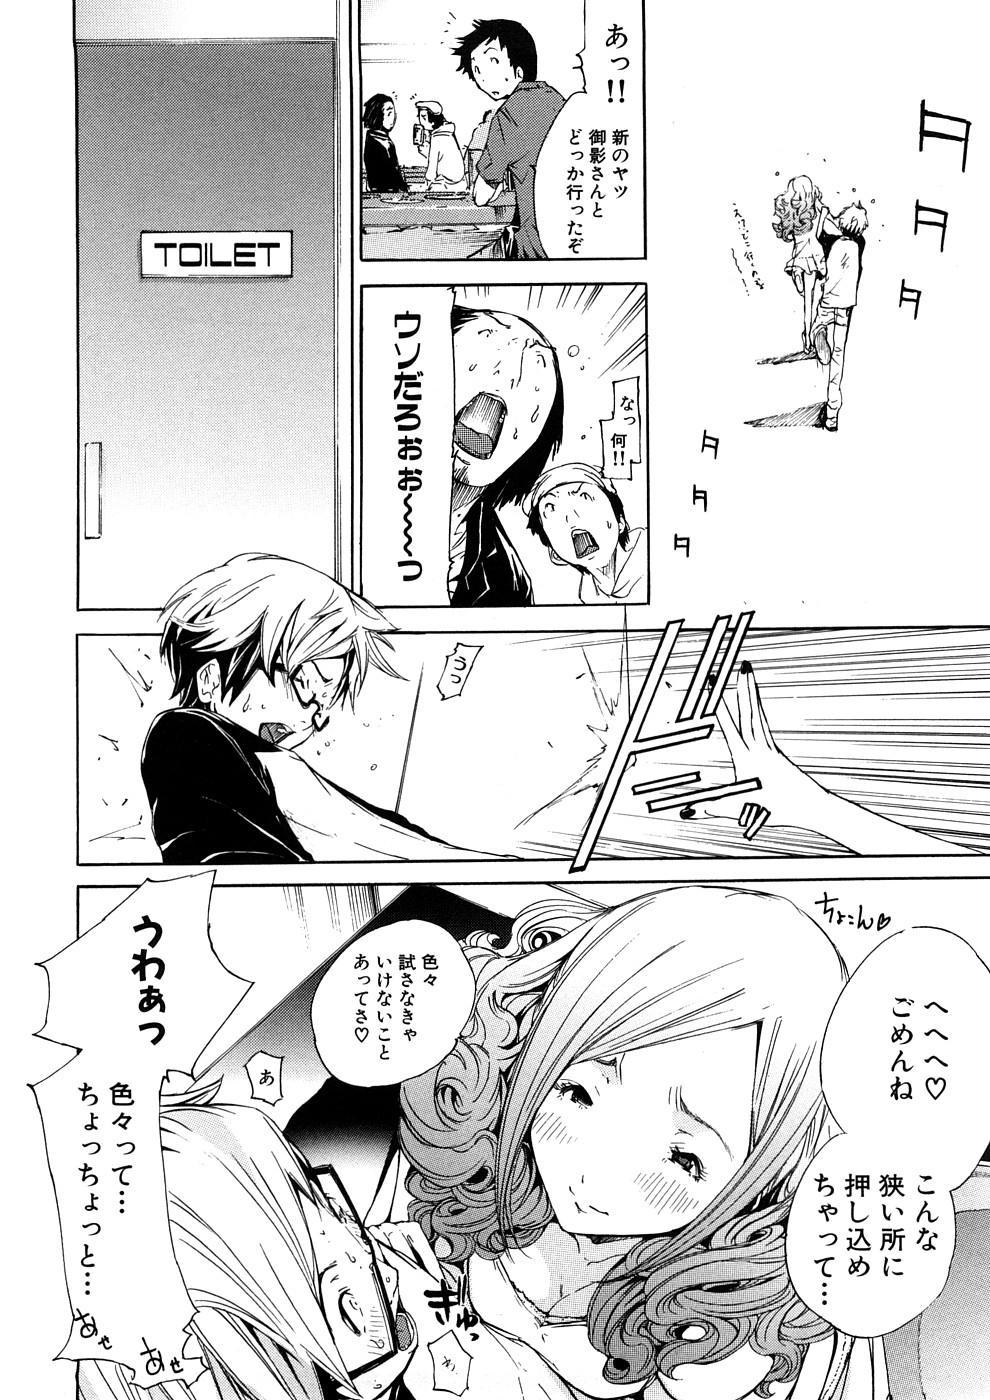 Geki Yaba Anthology Vol. 1 - Naka ni Dashite yo 34